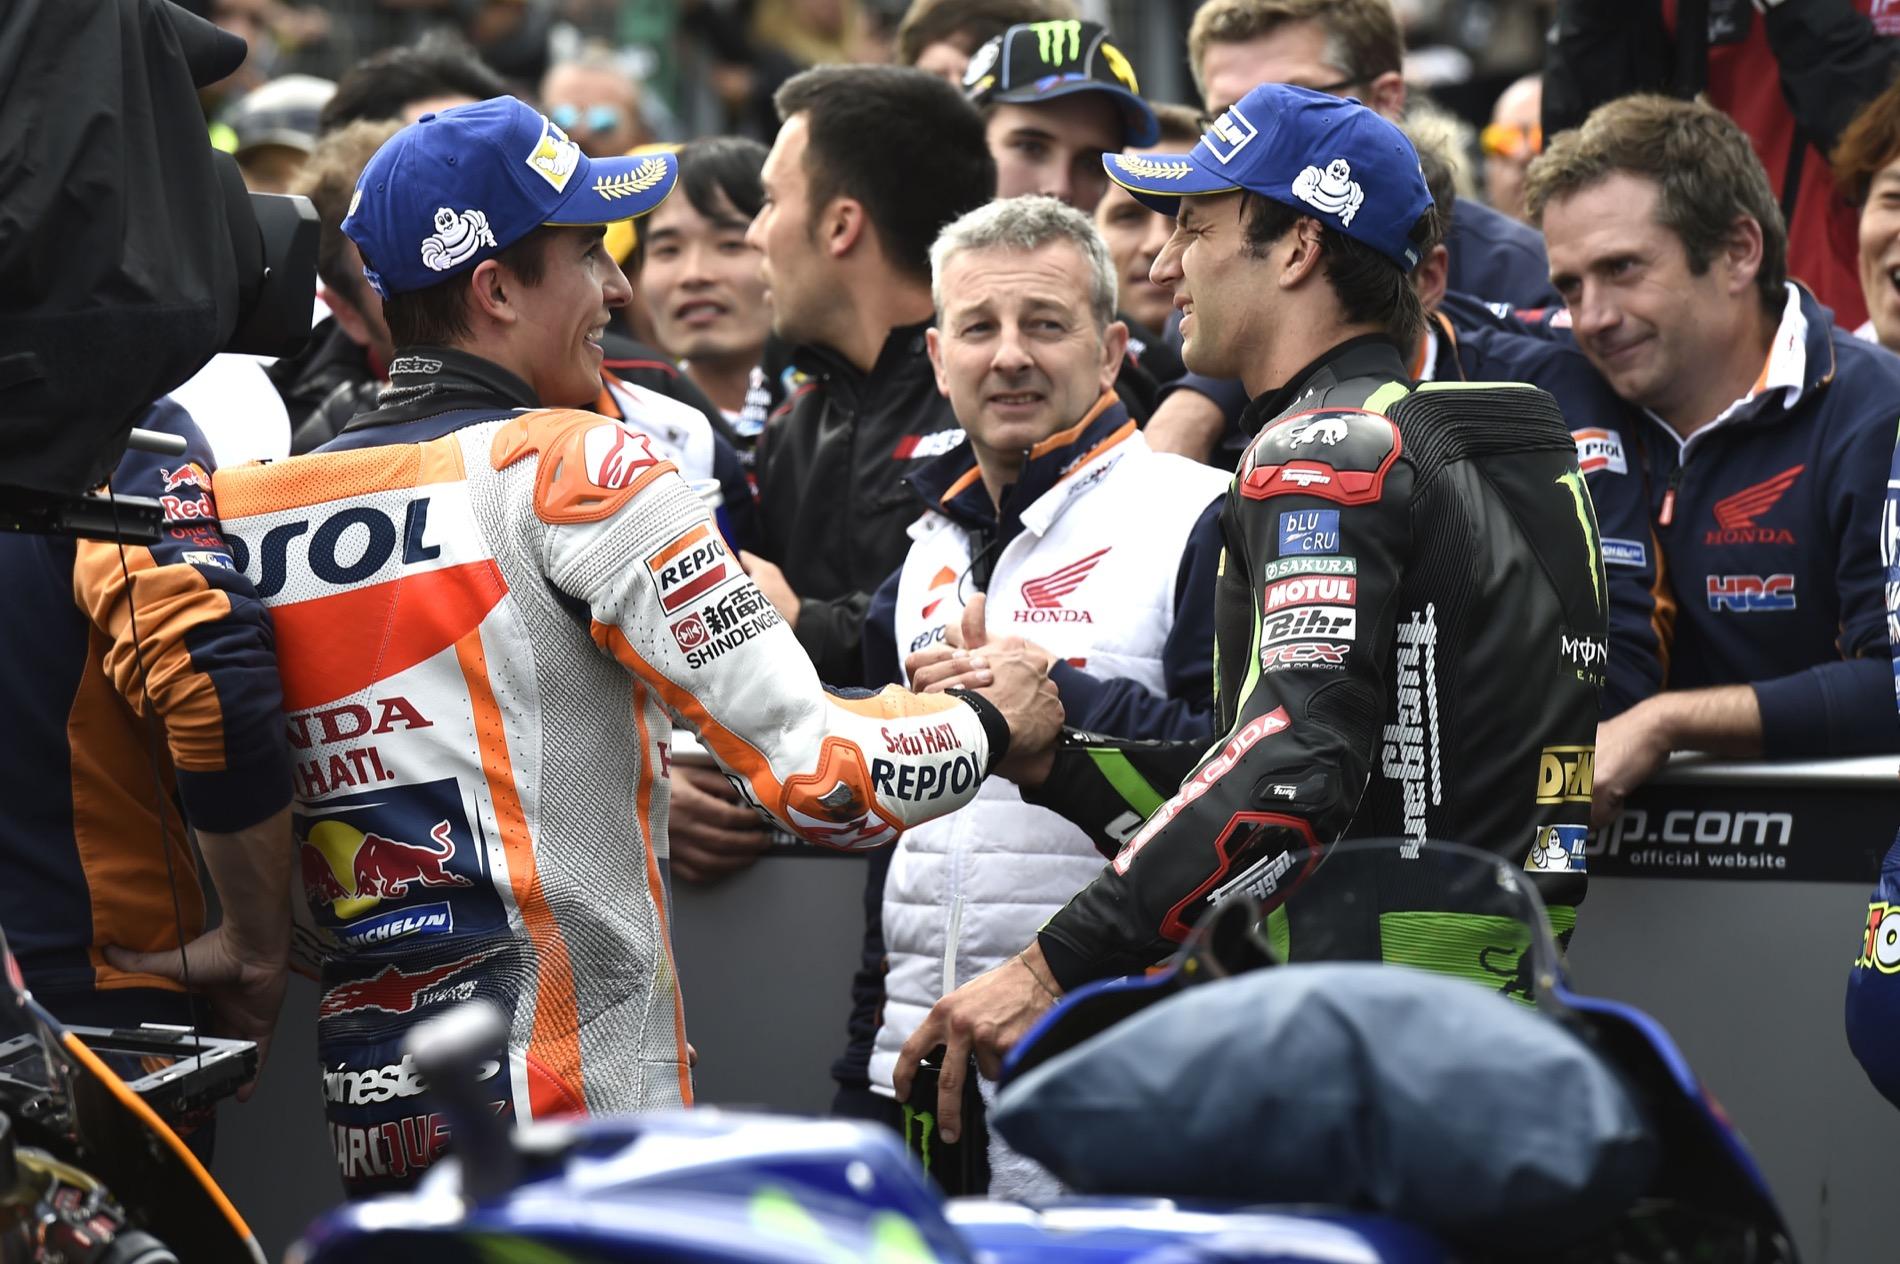 MotoGP Australia 2017, las mejores fotos